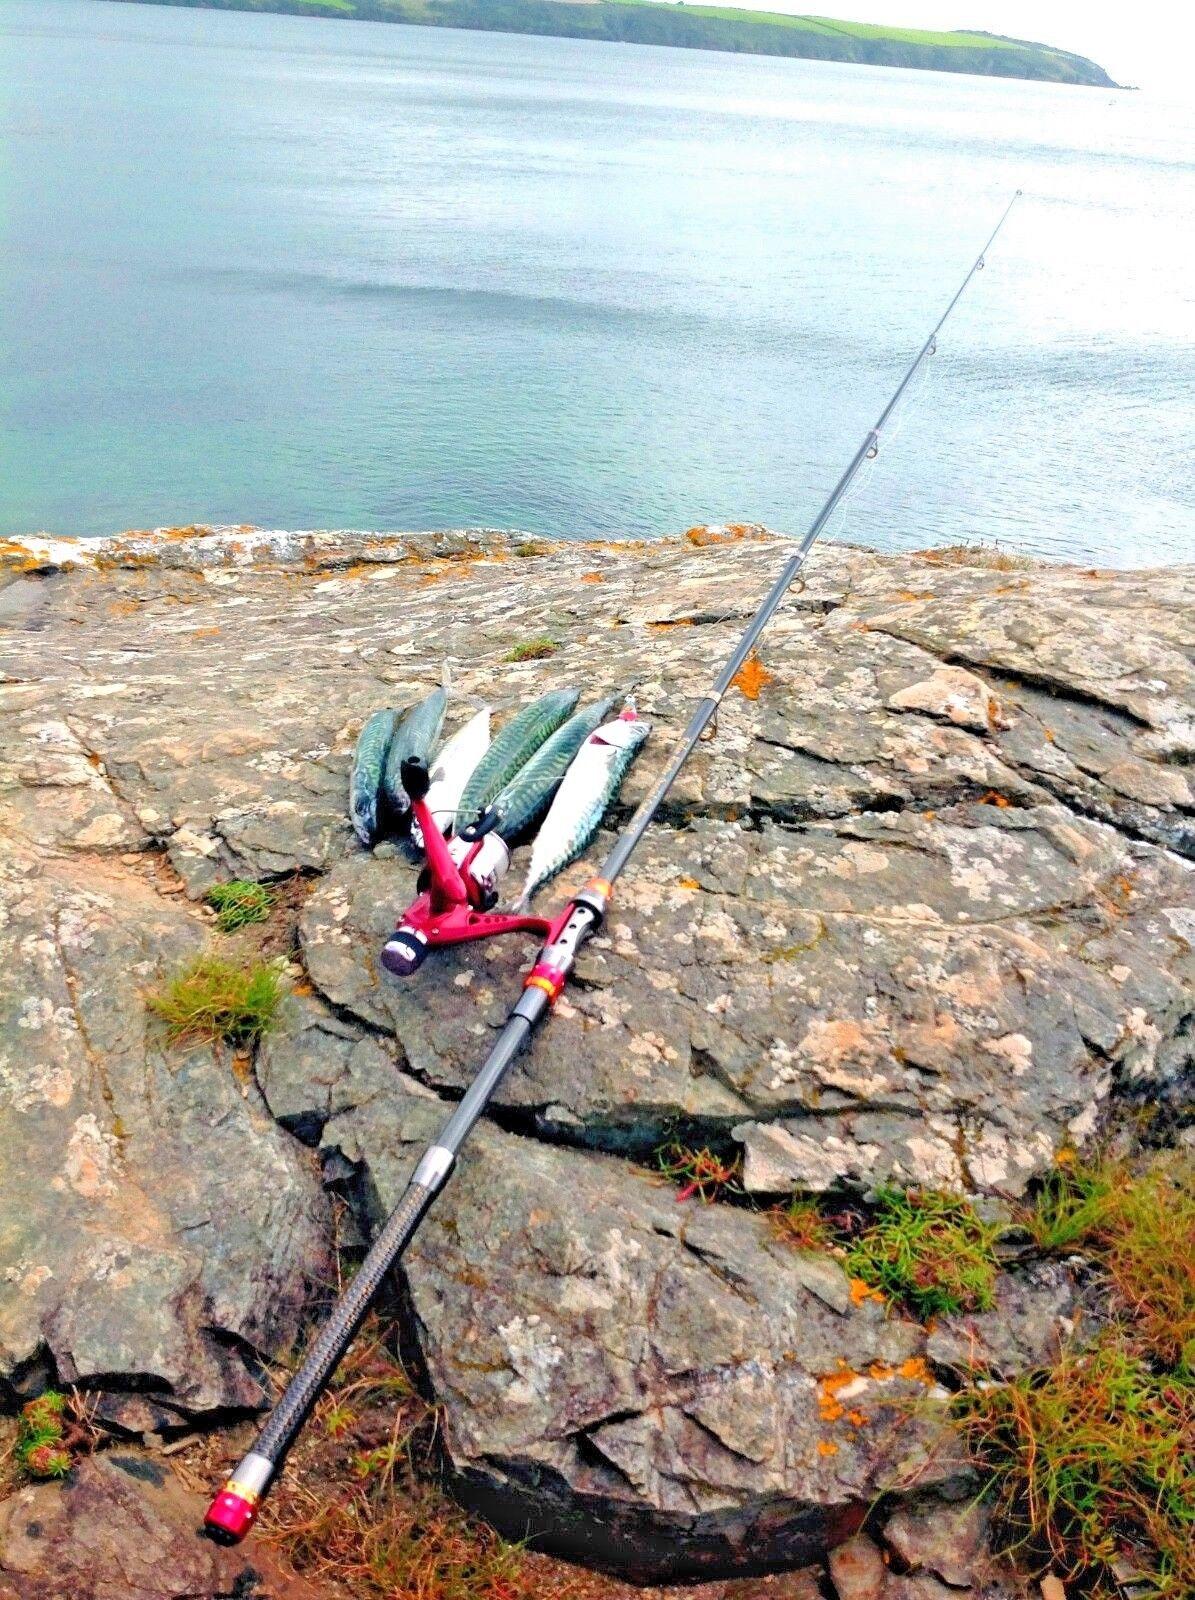 TRAVEL 3.0 METRE FISHING ROD & REEL SET inc LINE   GREAT FLOAT,SPINNING ROD